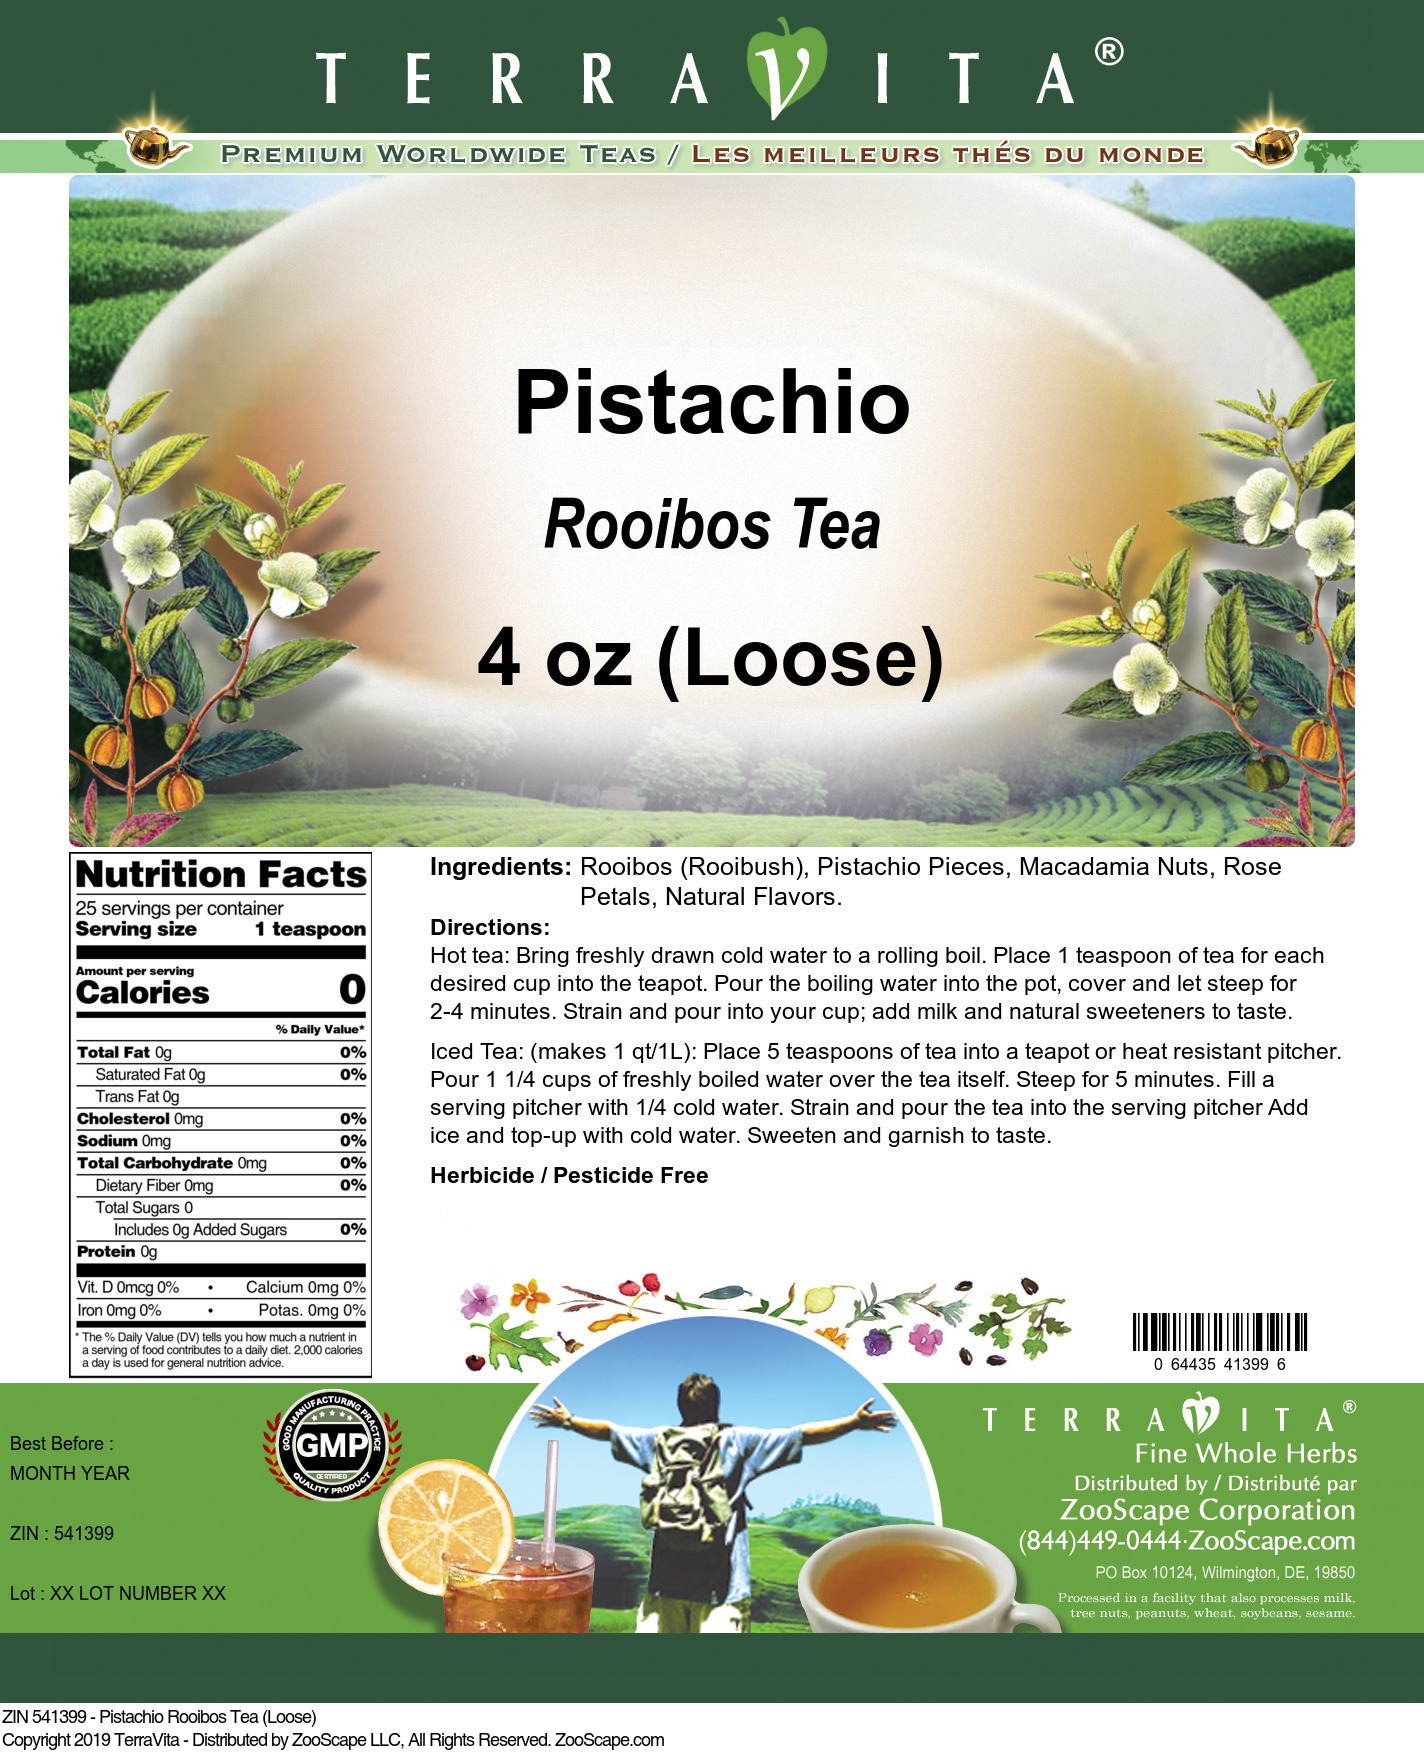 Pistachio Rooibos Tea (Loose)